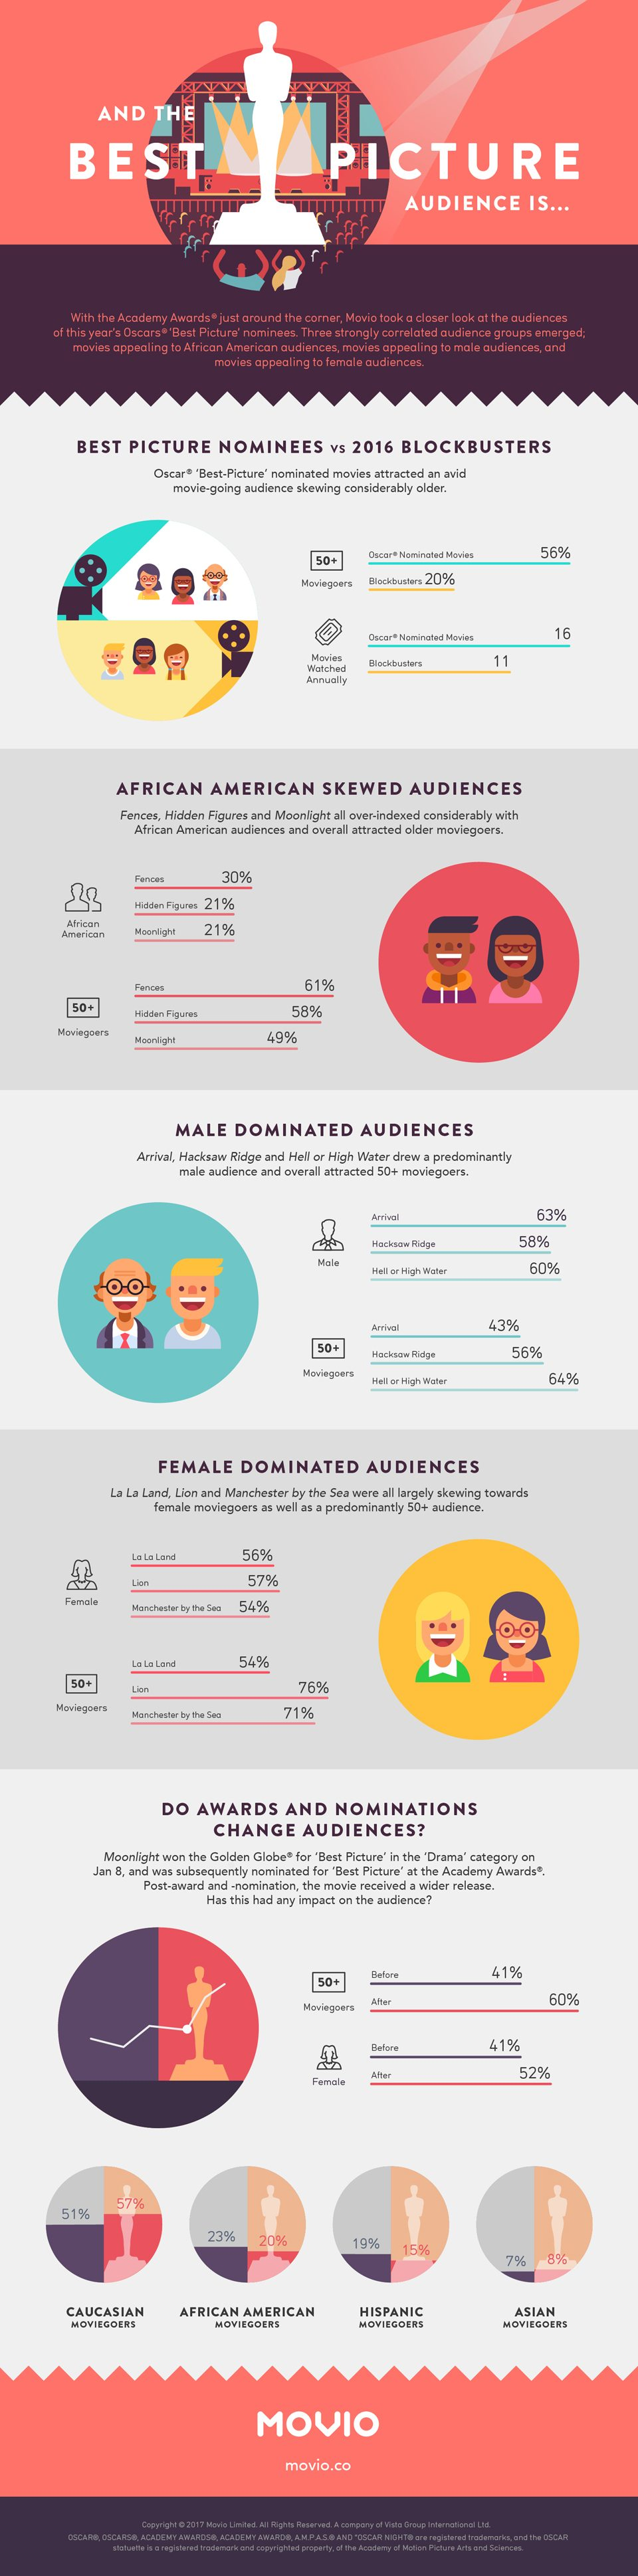 Movio and AARP 2017 Oscar Study Infographic